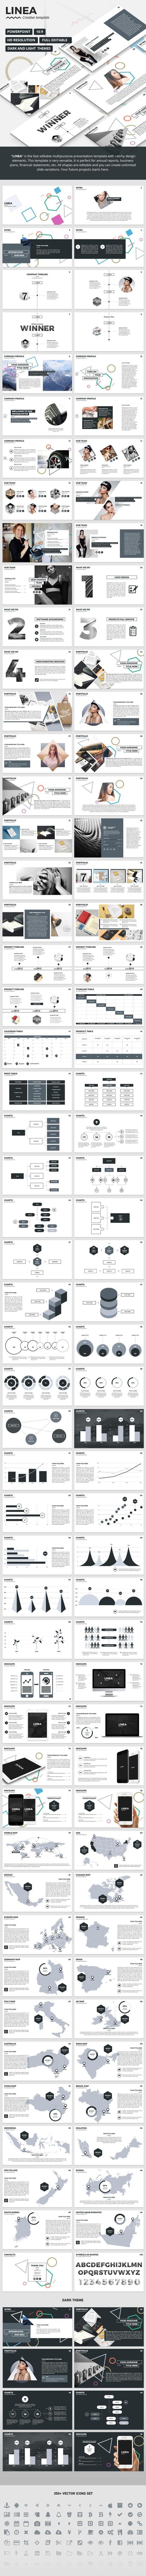 Linea - Creative PowerPoint Presentation Template - PowerPoint Templates Presentation Templates